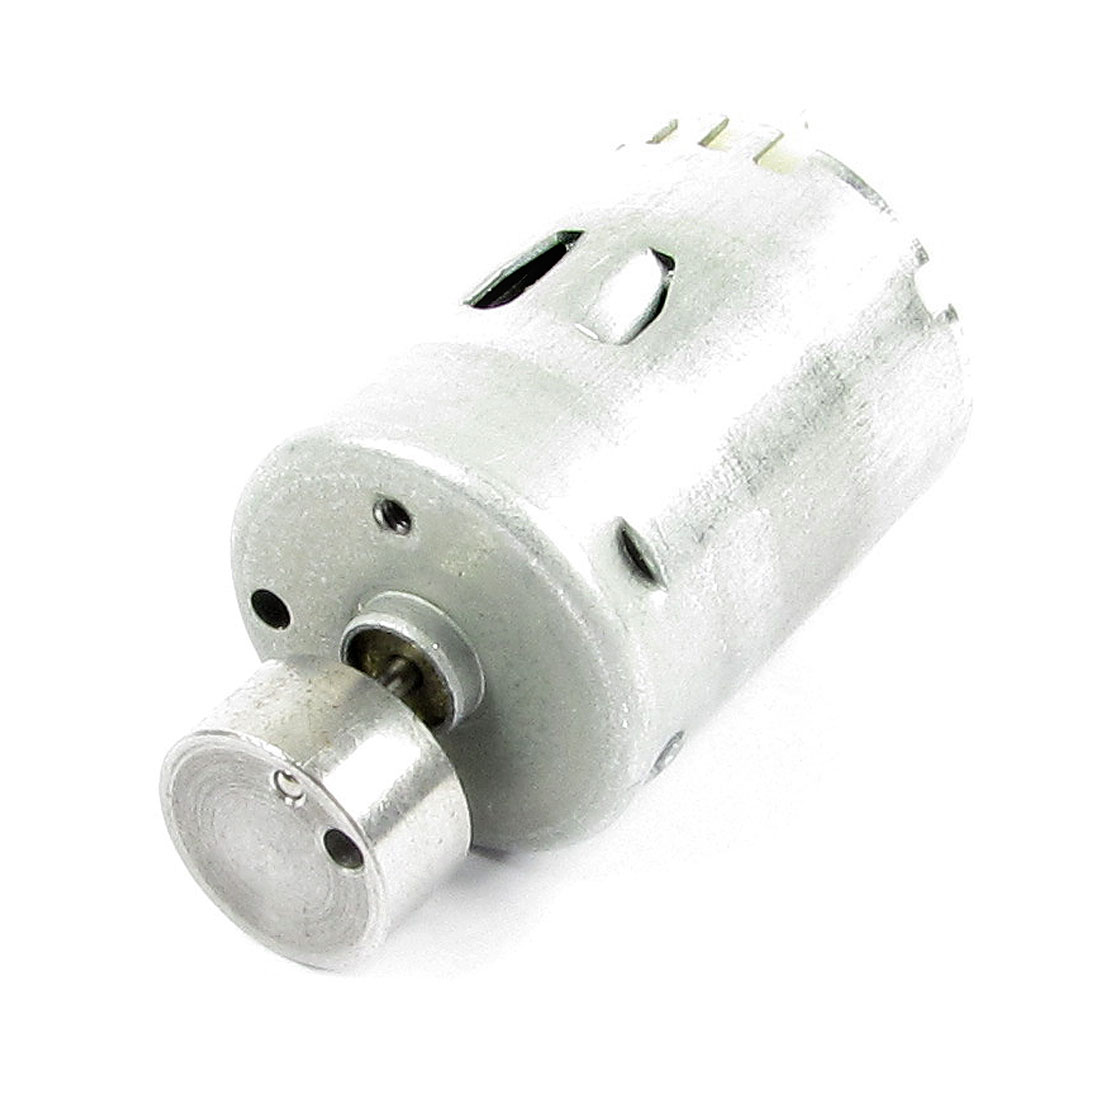 35000RPM 6V 2 Terminals Magnet Vibration DC Motor